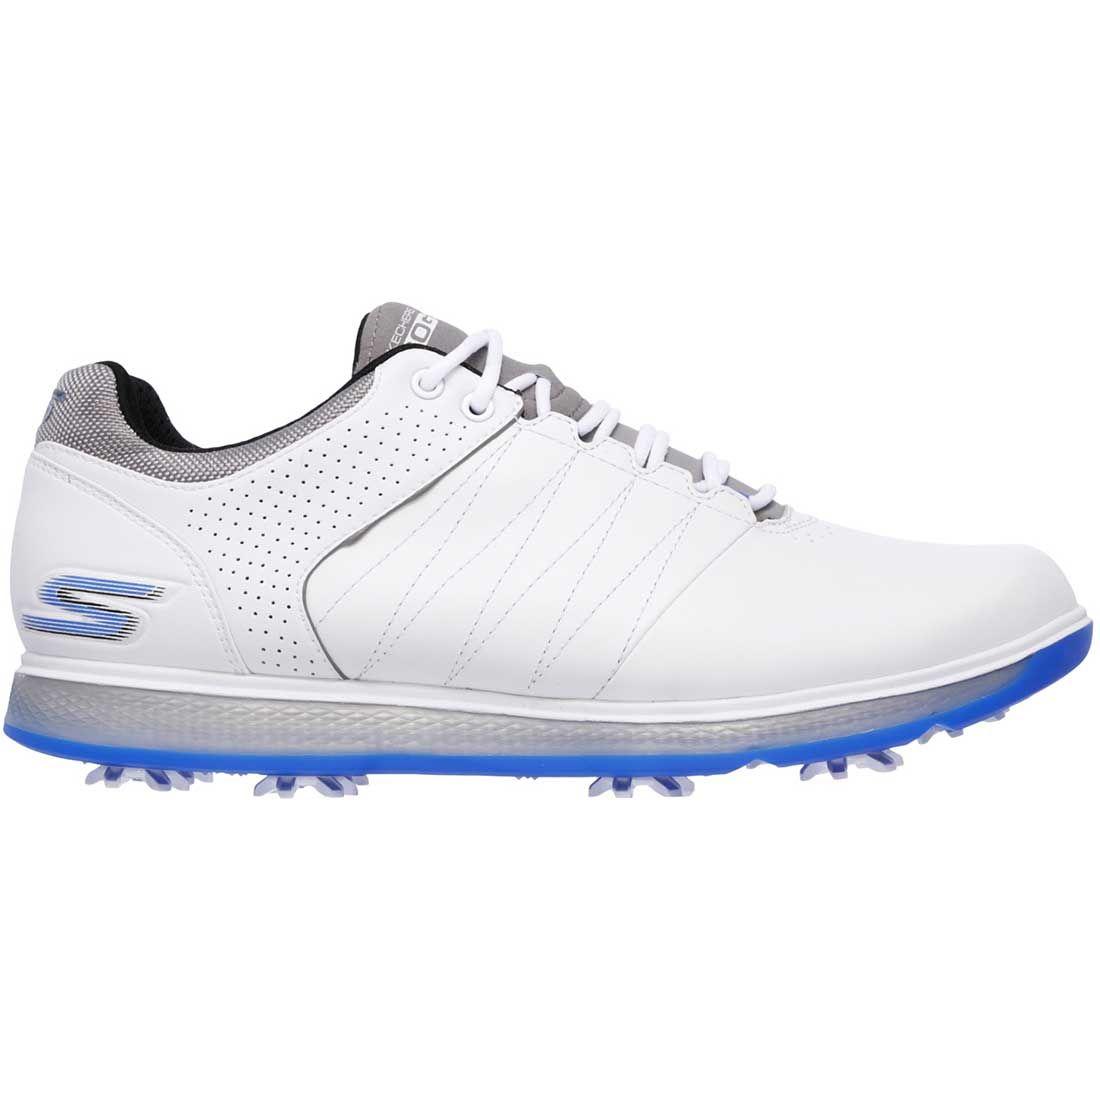 Buy Skechers GO GOLF Pro 2 Golf Shoes